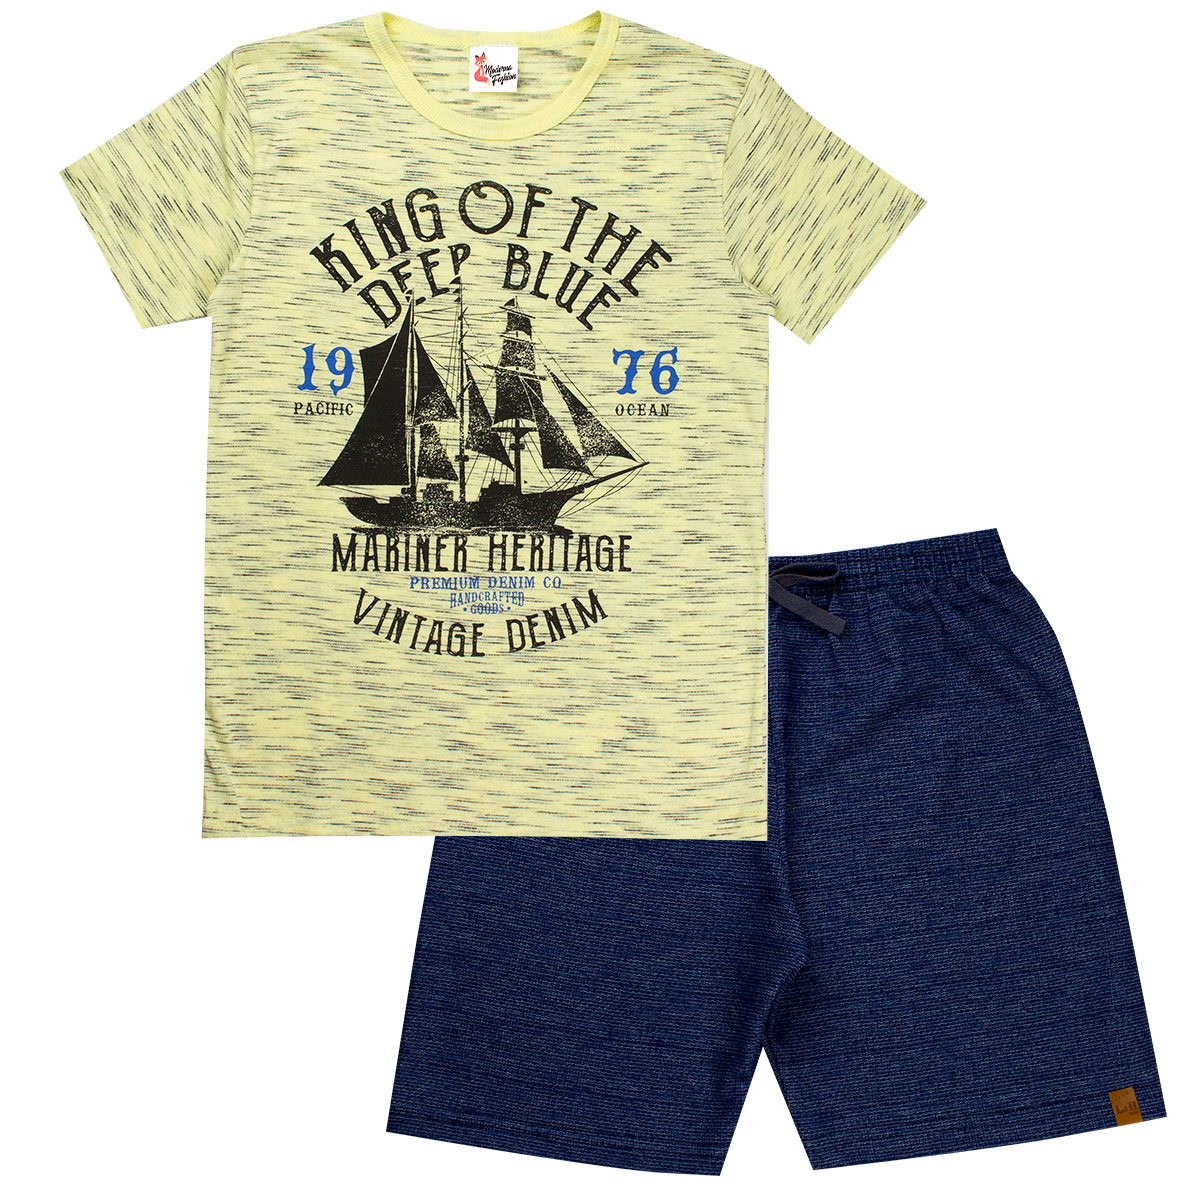 Kit 4 Conjuntos Infantis Meninos Roupas Juvenil Verão